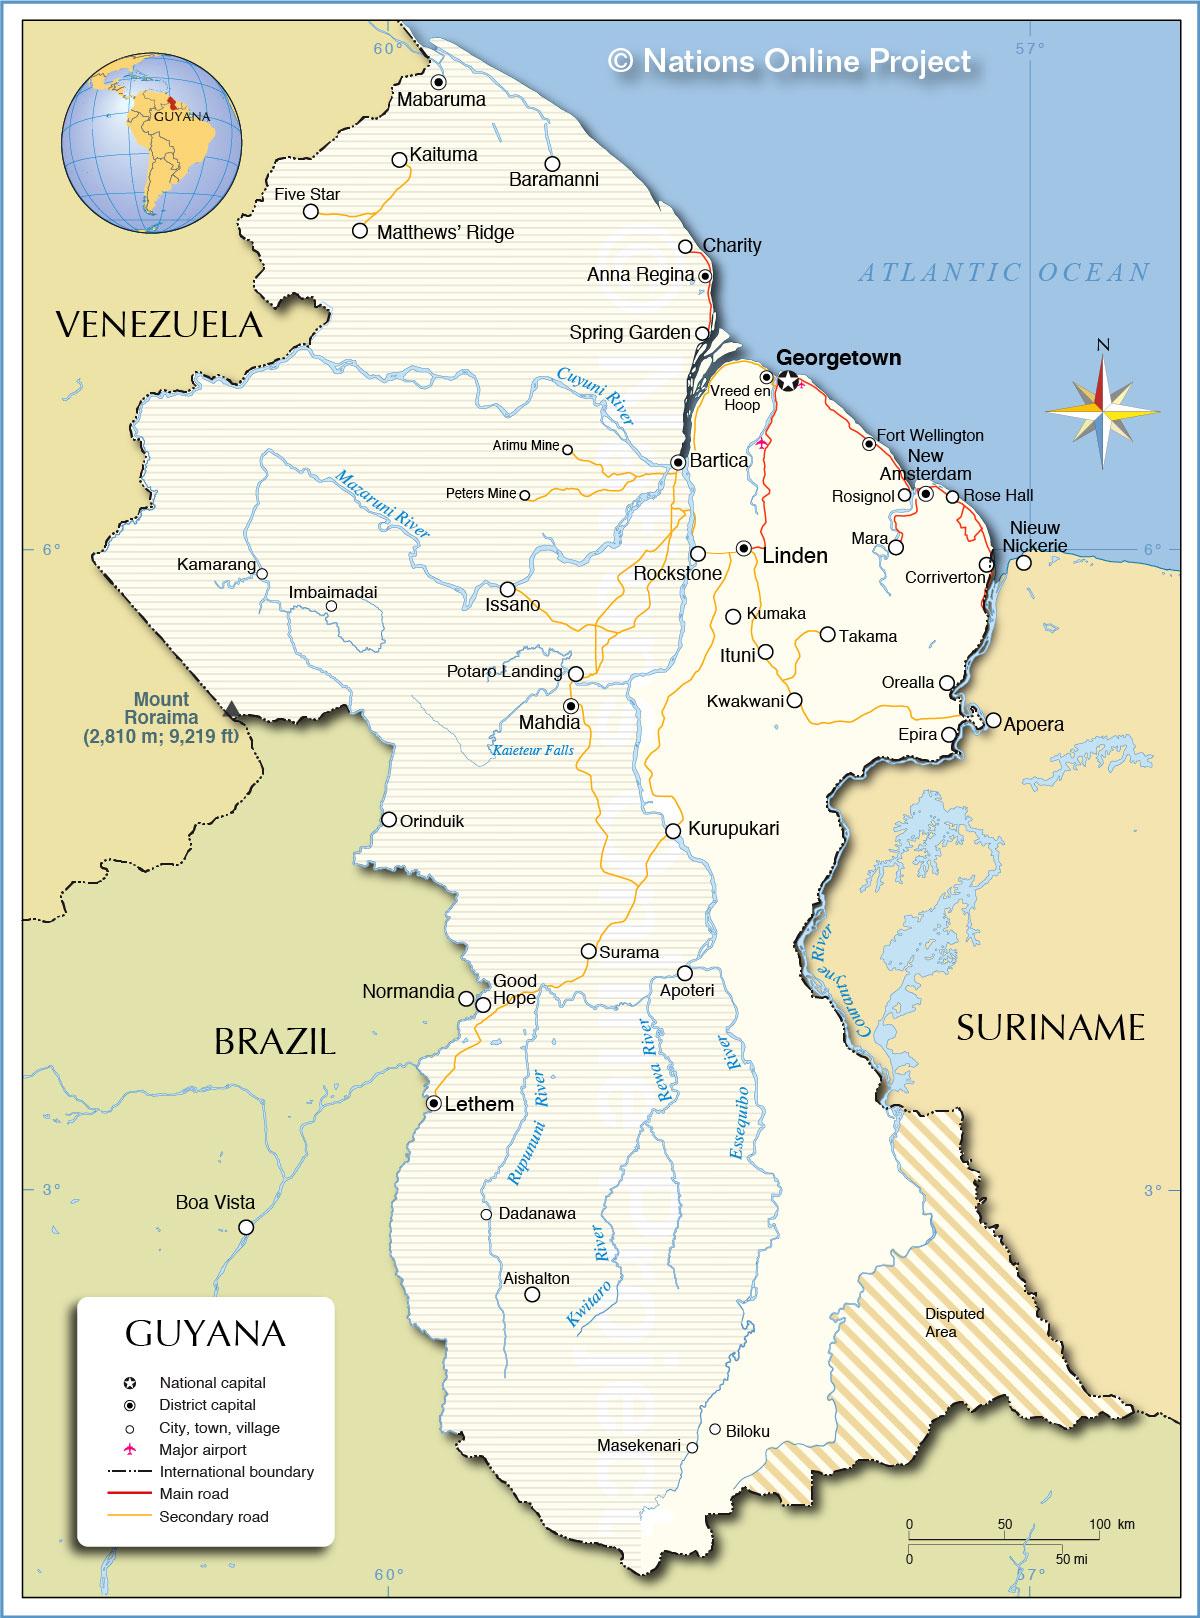 Political Map of Guyana - Nations Online Project on map of isla margarita, map of campinas, map of san pedro de atacama, map of bissau, map of guatemala, map of regions of brazil, map of culiacan, map of south of the border, map of san pedro de macoris, map of asunción, map of ciudad del este, map of pereira, map of san pedro la laguna, map of central america, map of ilhabela, map of antarctic sound, map of sunset boulevard, map of la serena, map of honduras, map of san cristobal de las casas,